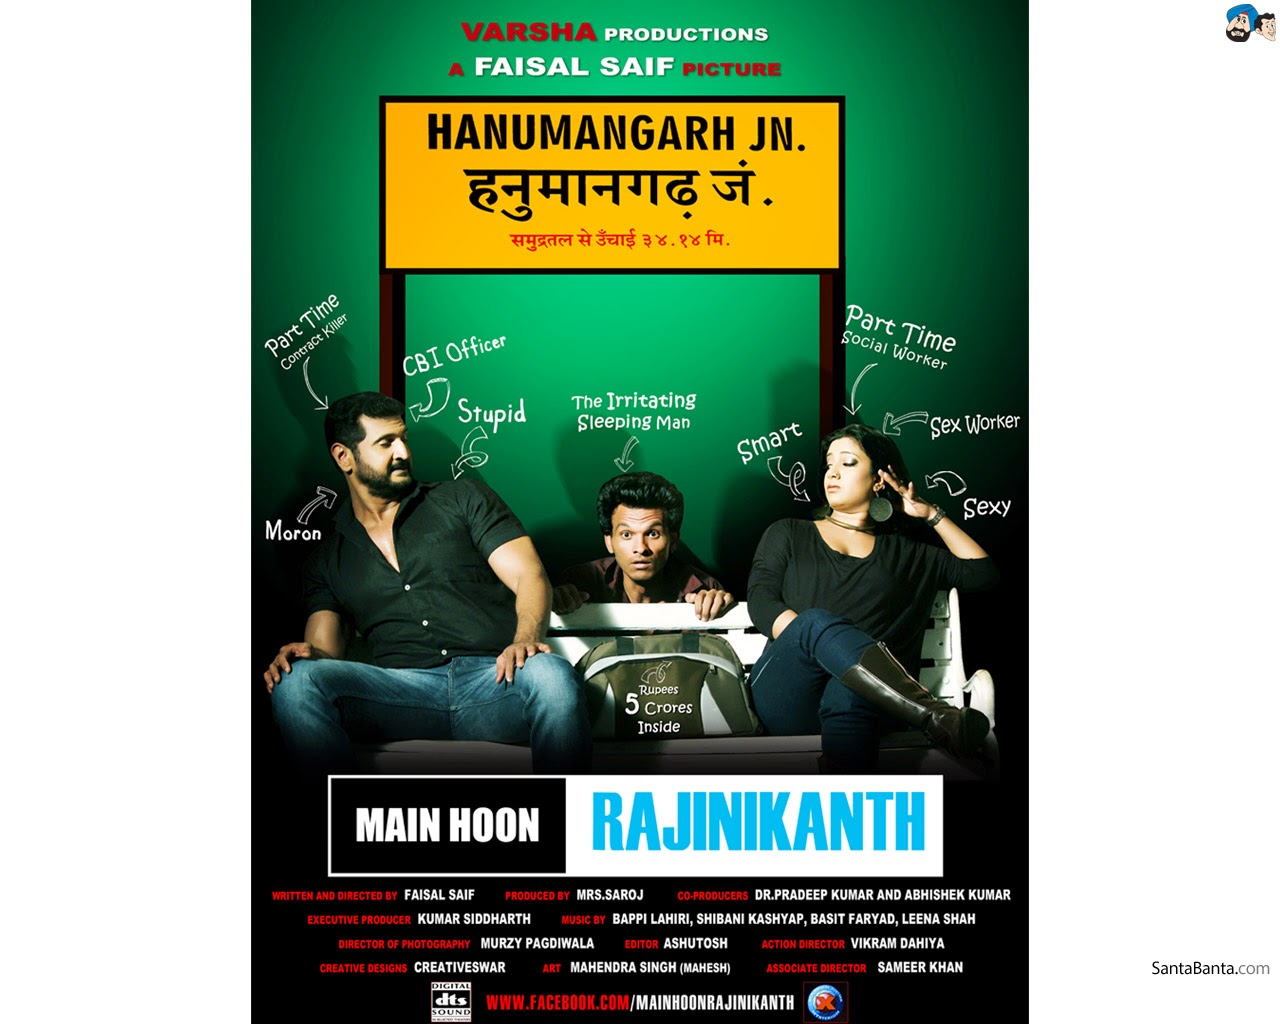 bollywood movie télécharger mp4 gratuitement